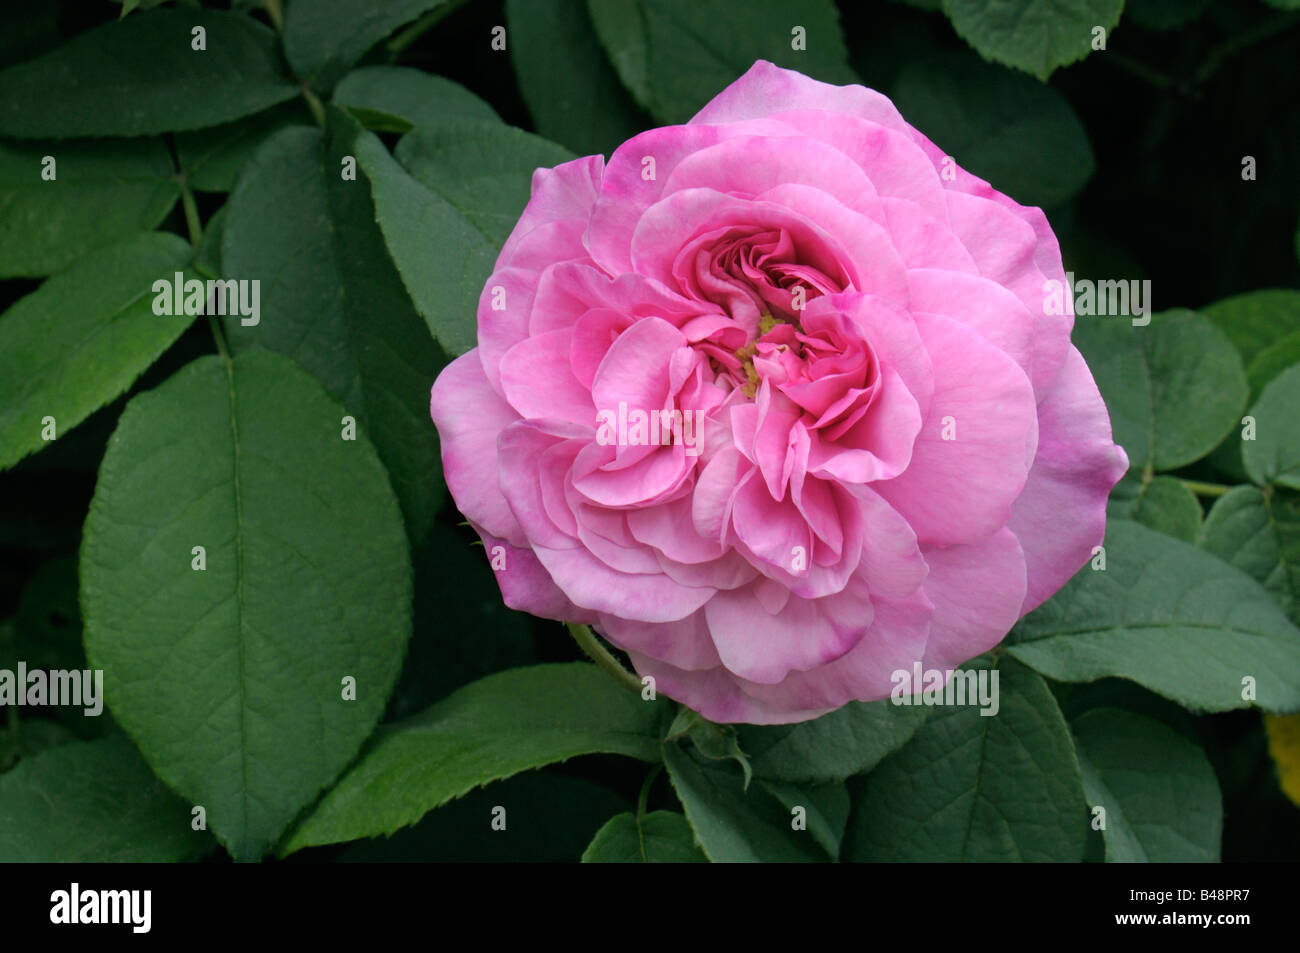 damask rose rosa x damascena variety ispahan flower stock photo 19862507 alamy. Black Bedroom Furniture Sets. Home Design Ideas